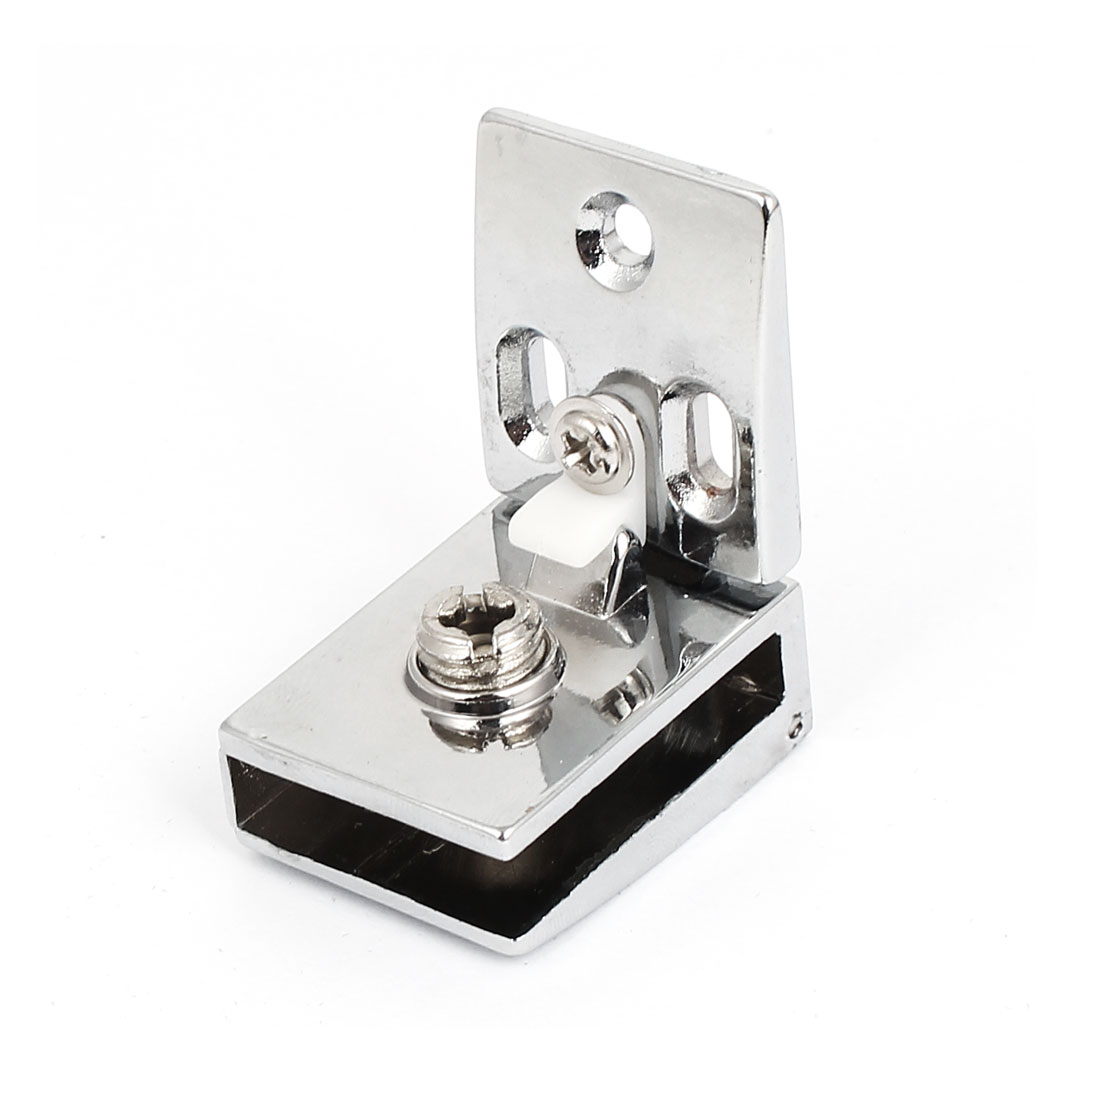 Thickness Zinc Alloy Adjustable Glass Door Hinge Silver Tone 81Mm Long